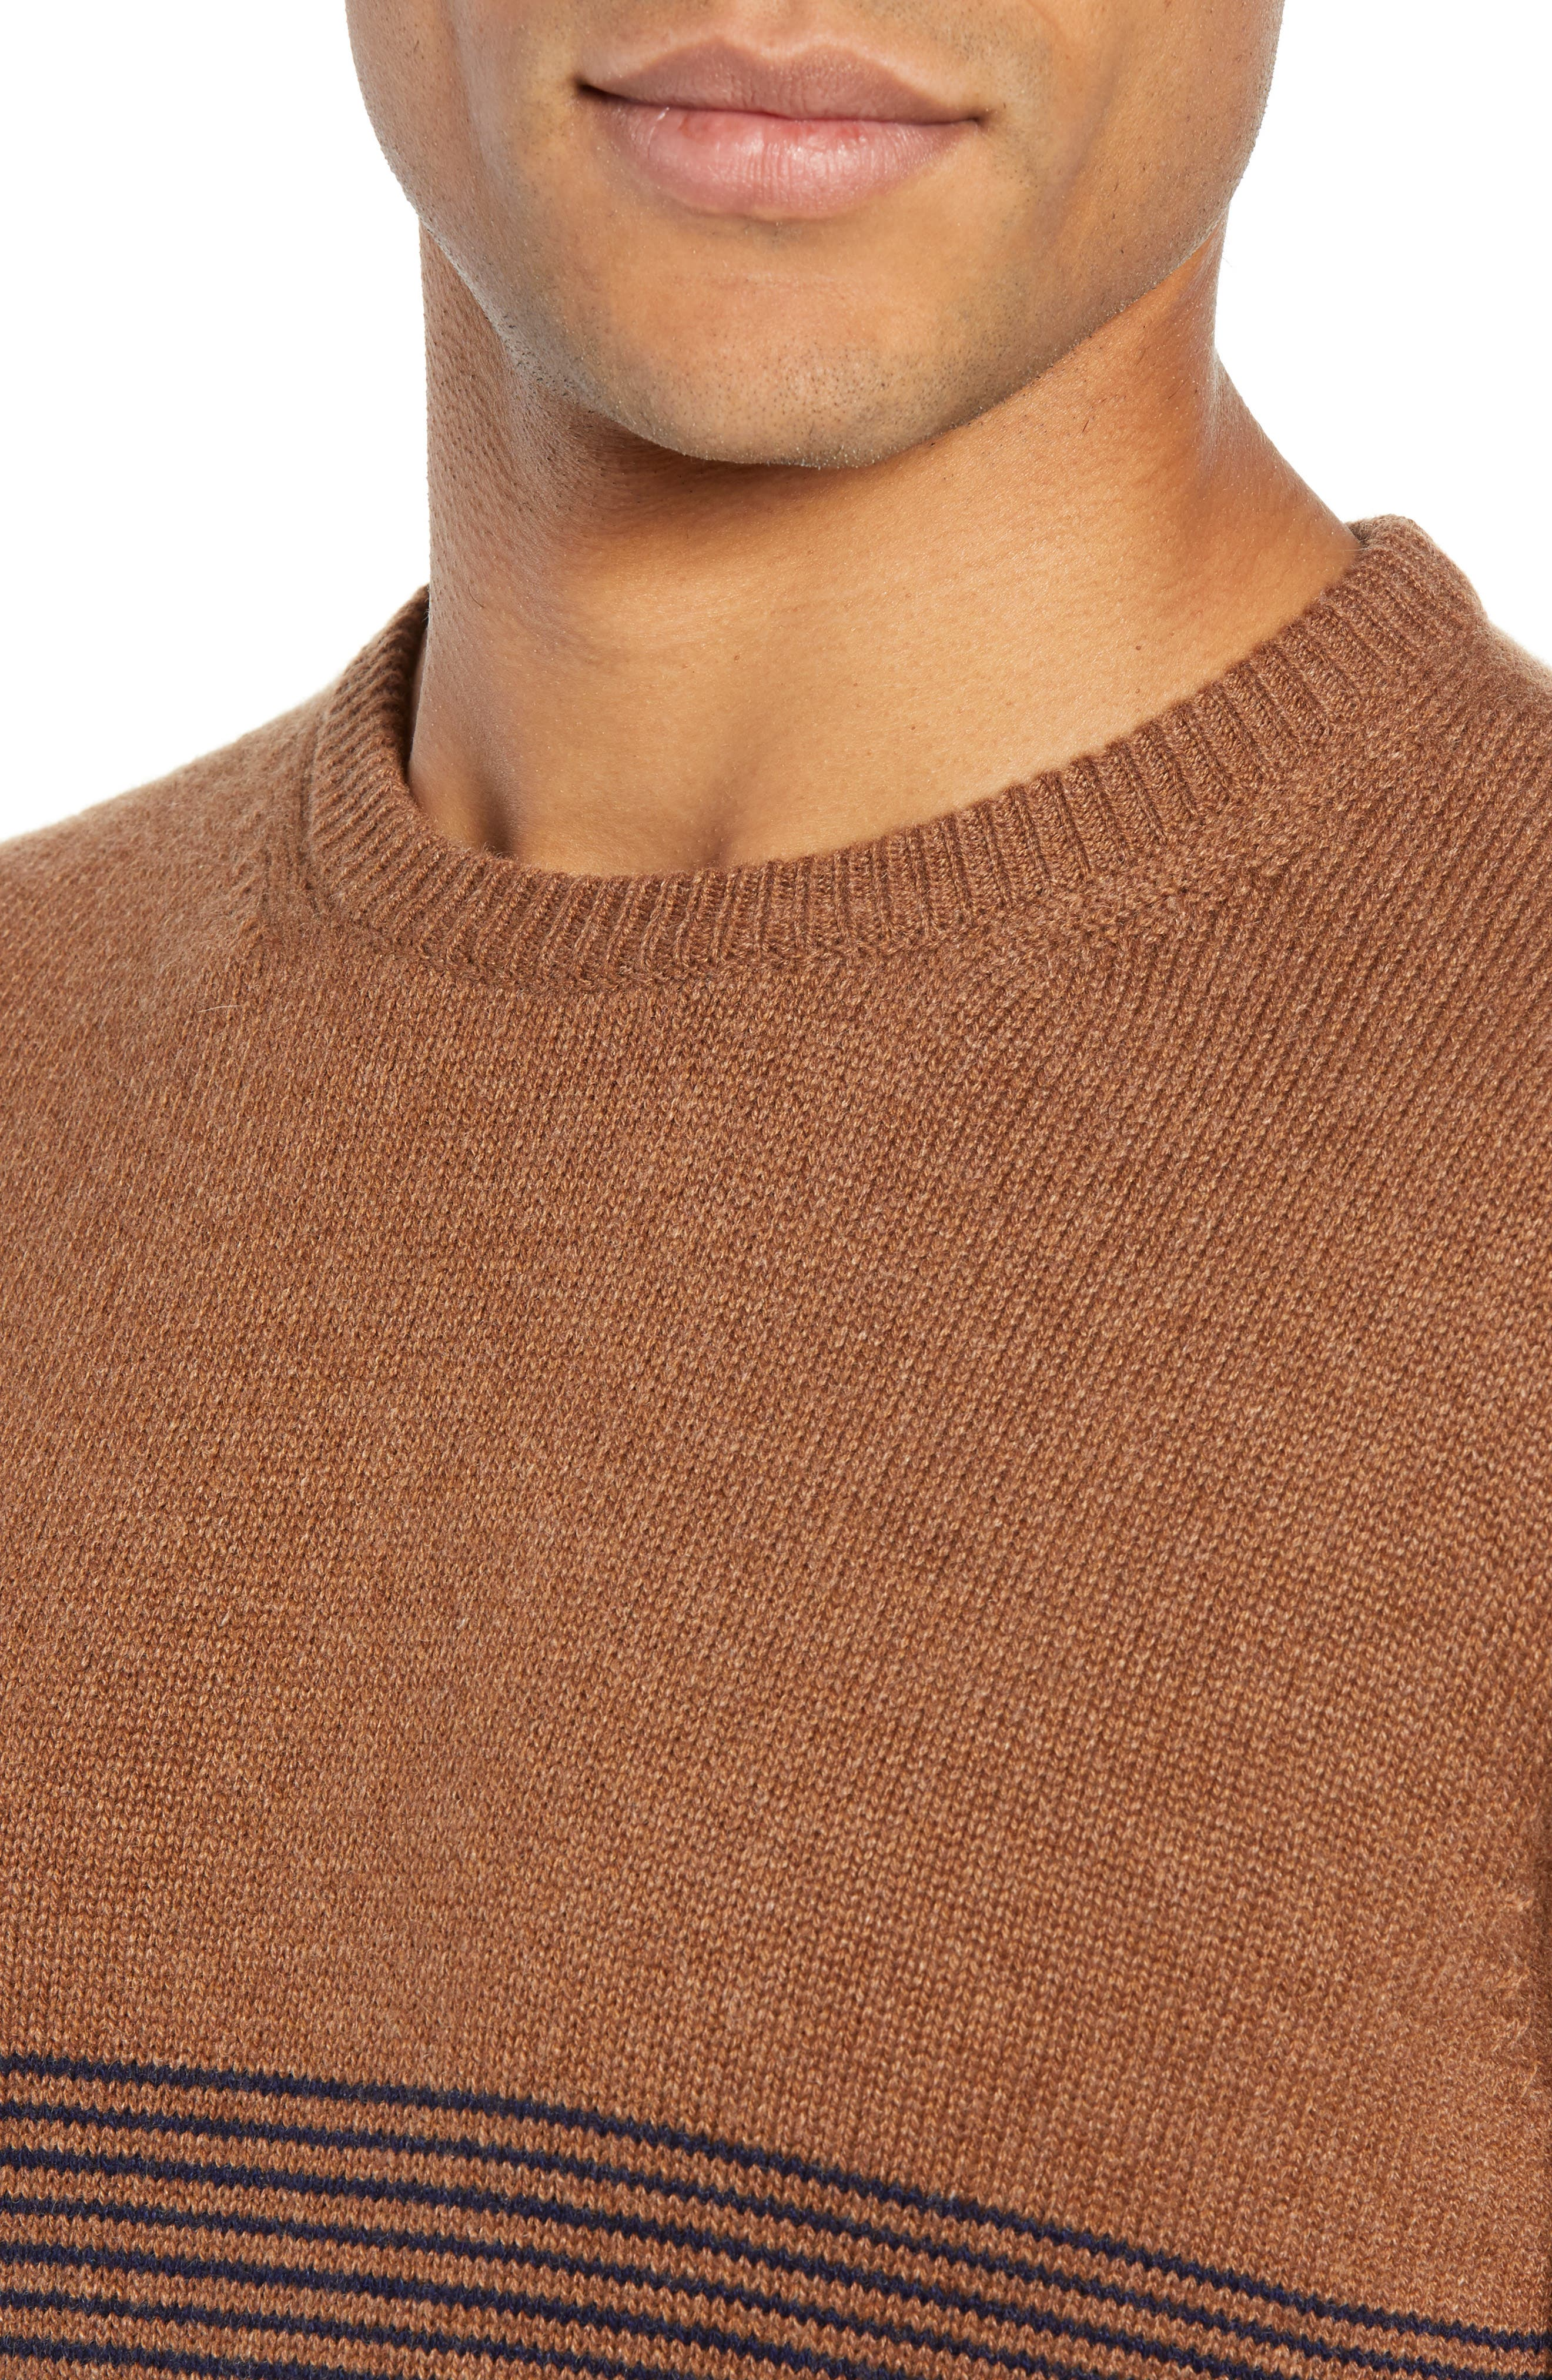 Trim Fit Cashmere Sweater,                             Alternate thumbnail 4, color,                             GREY